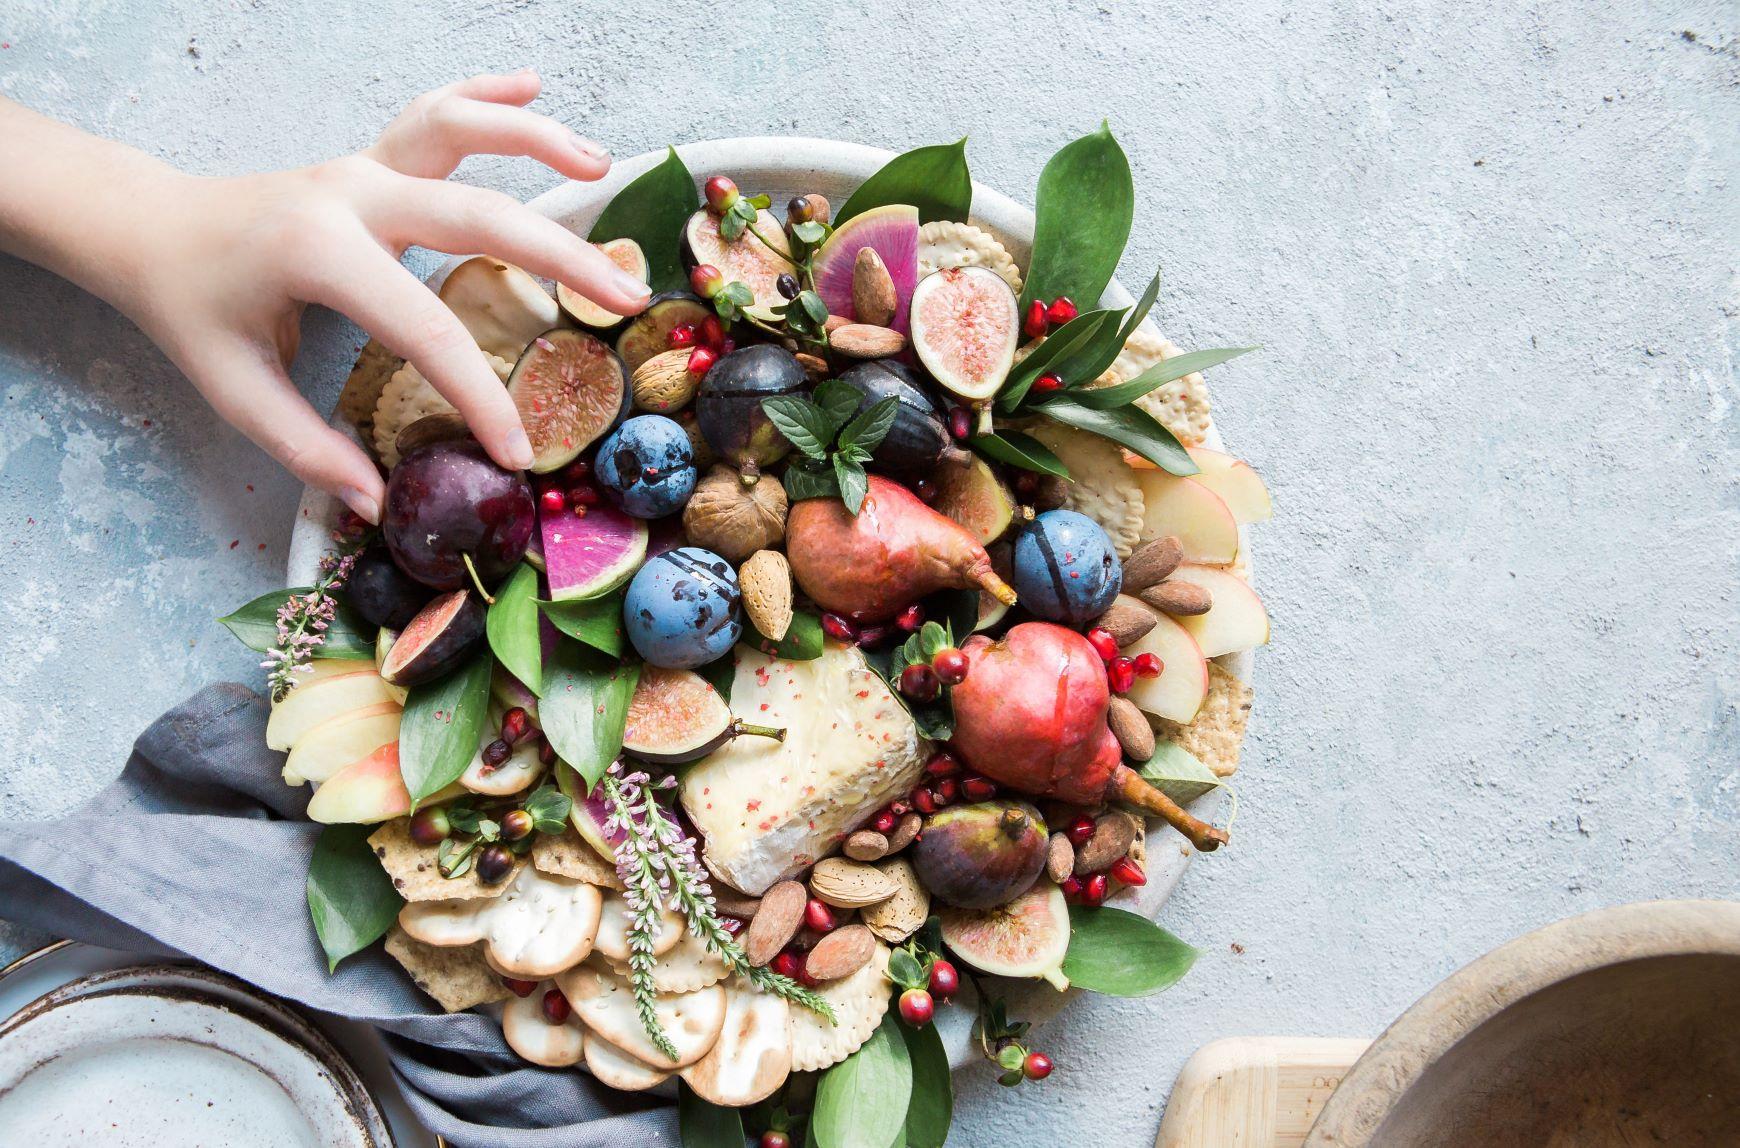 INSTAGRAM WORTHY RESTAURANTS, CAFES AND FOOD - Fig Food Trends